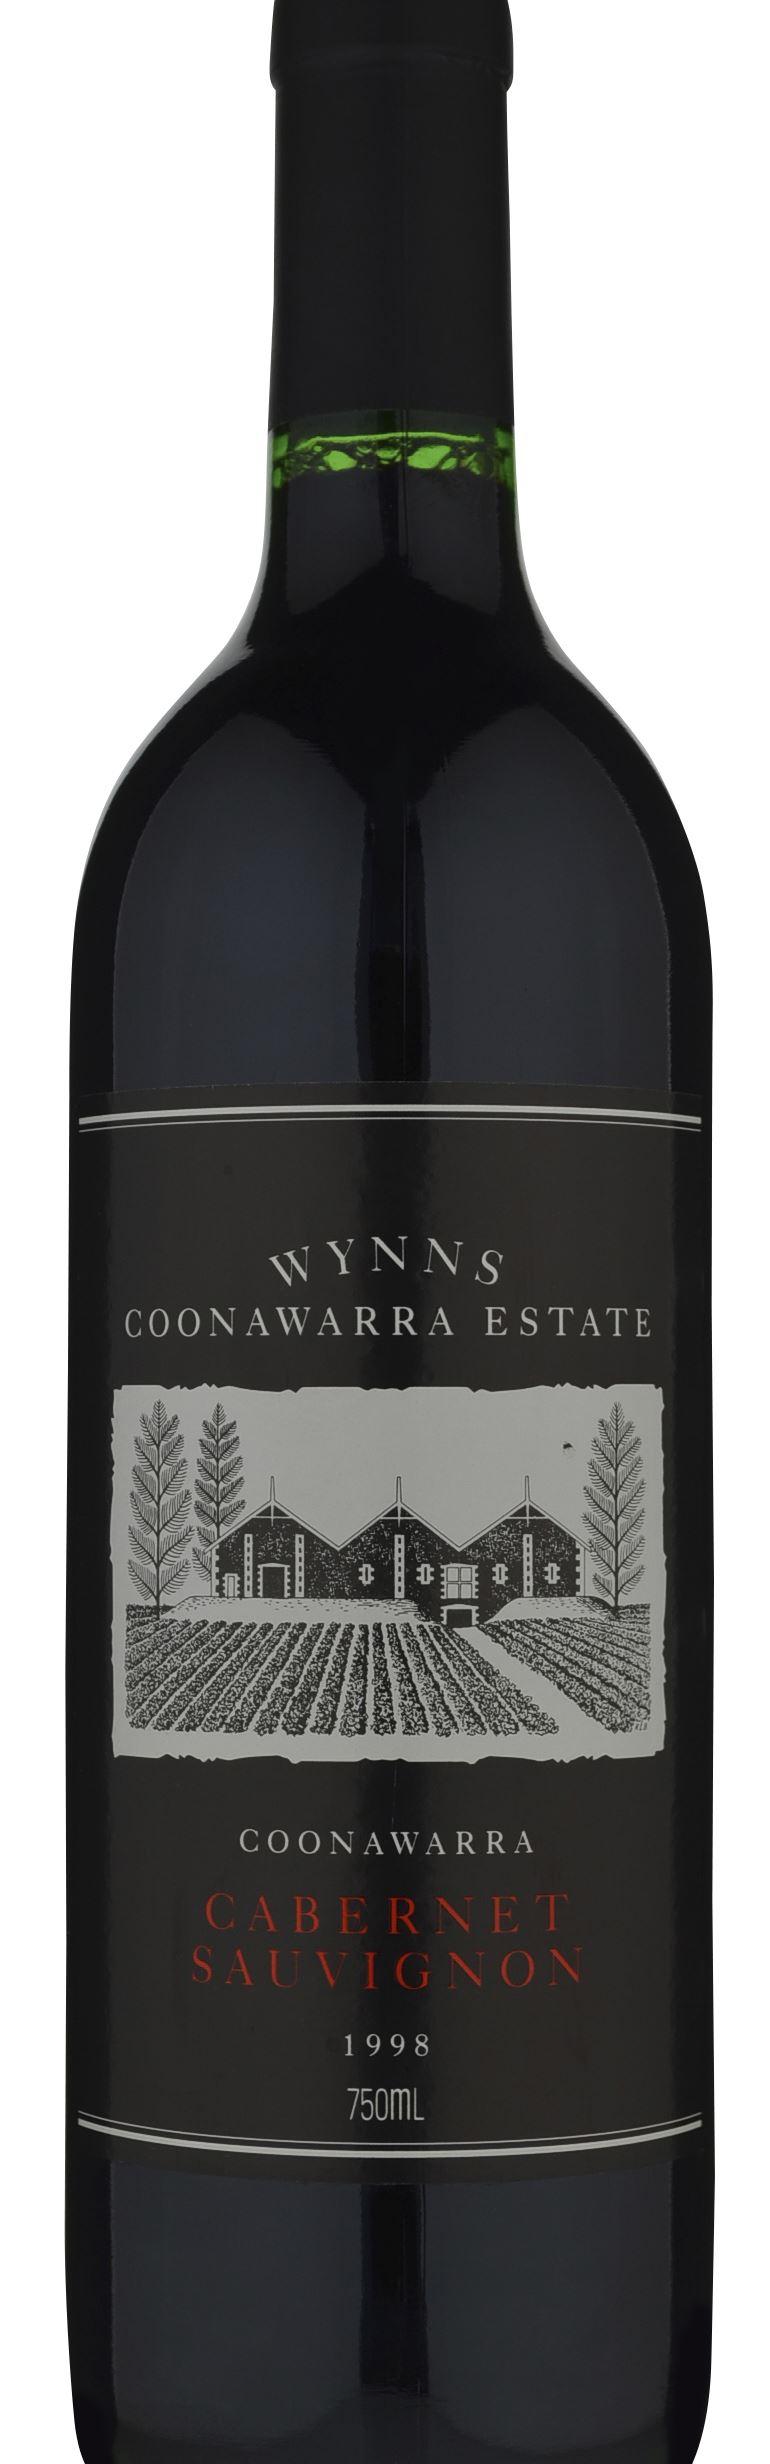 It is an image of Gargantuan Wynns Coonawarra Estate Black Label Cabernet Sauvignon